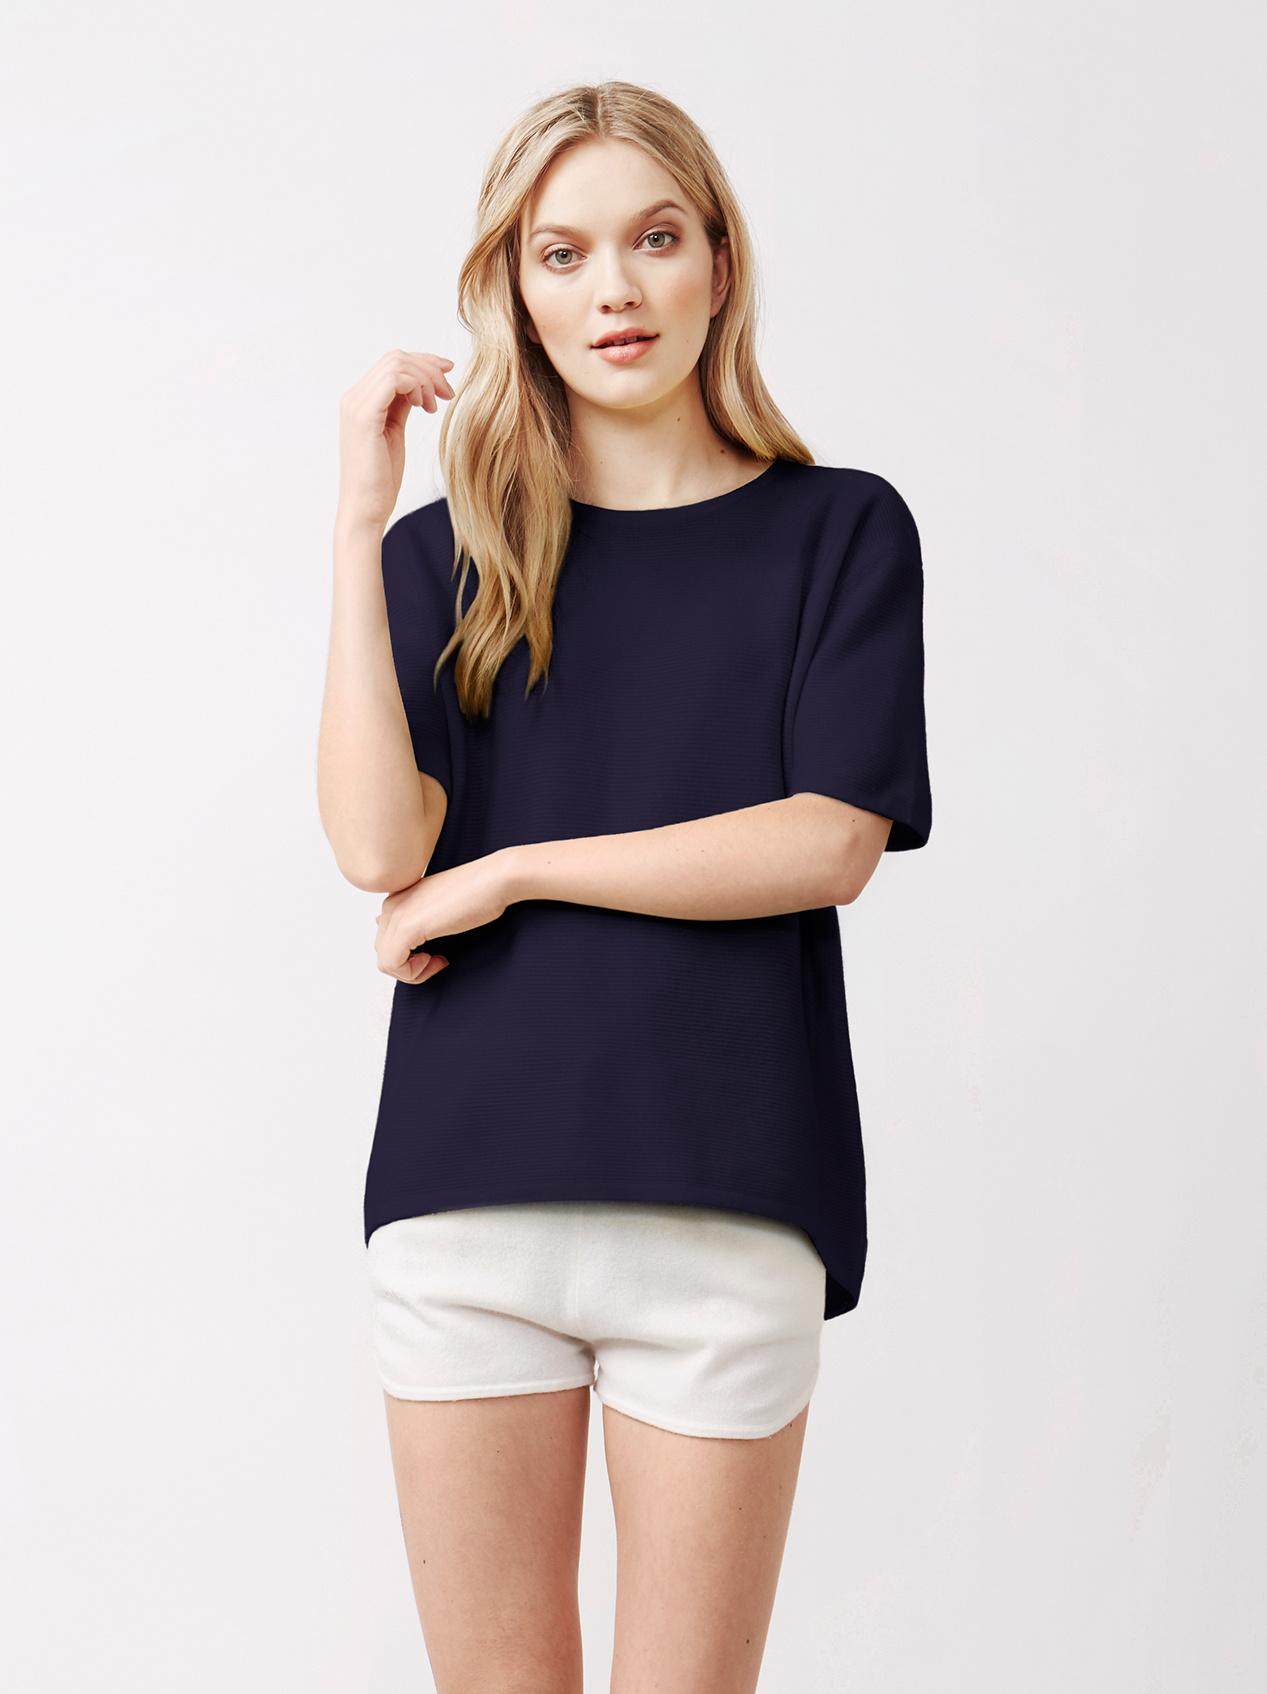 Soft Goat Women's Curved T-Shirt Navy